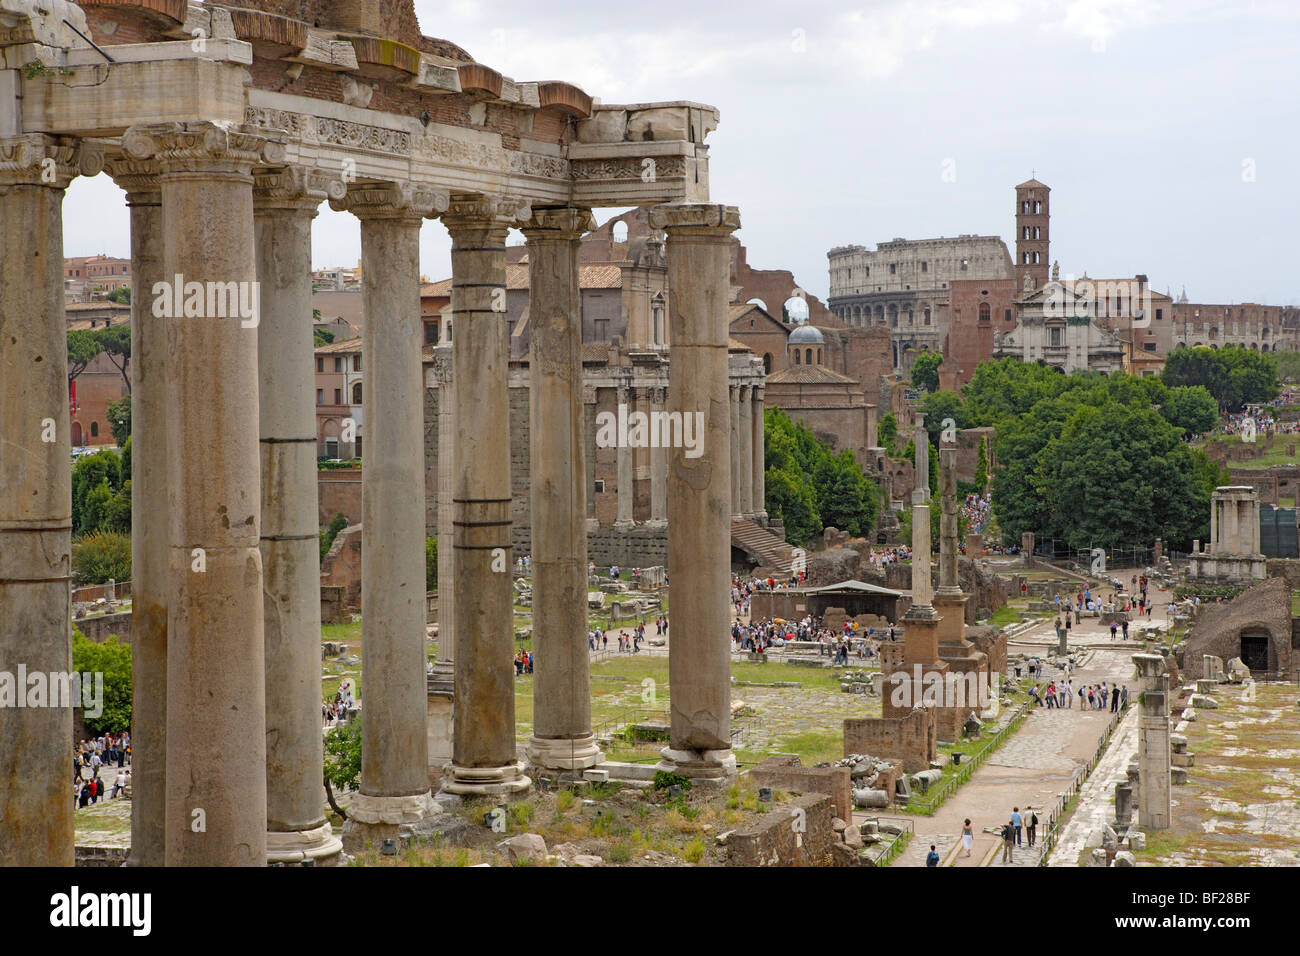 File:Tavares.Forum.Romanum.redux.jpg - Wikimedia Commons